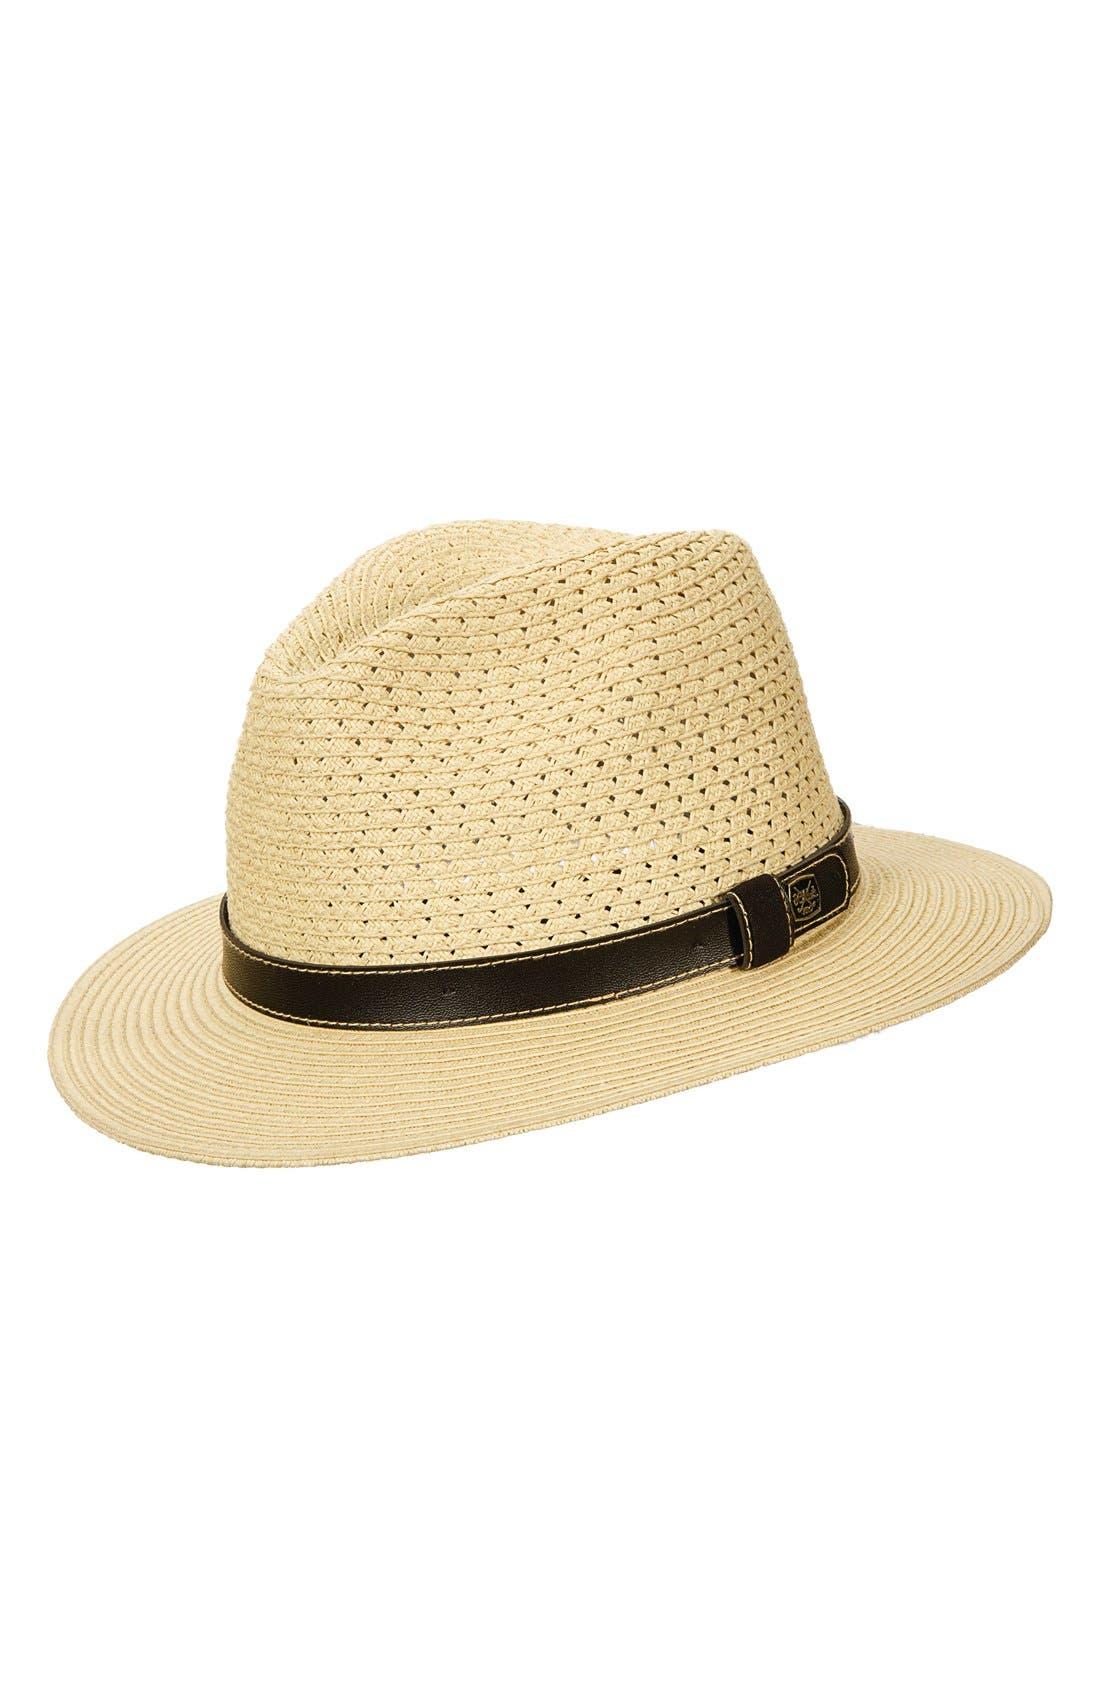 SCALA Safari Hat, Main, color, 101